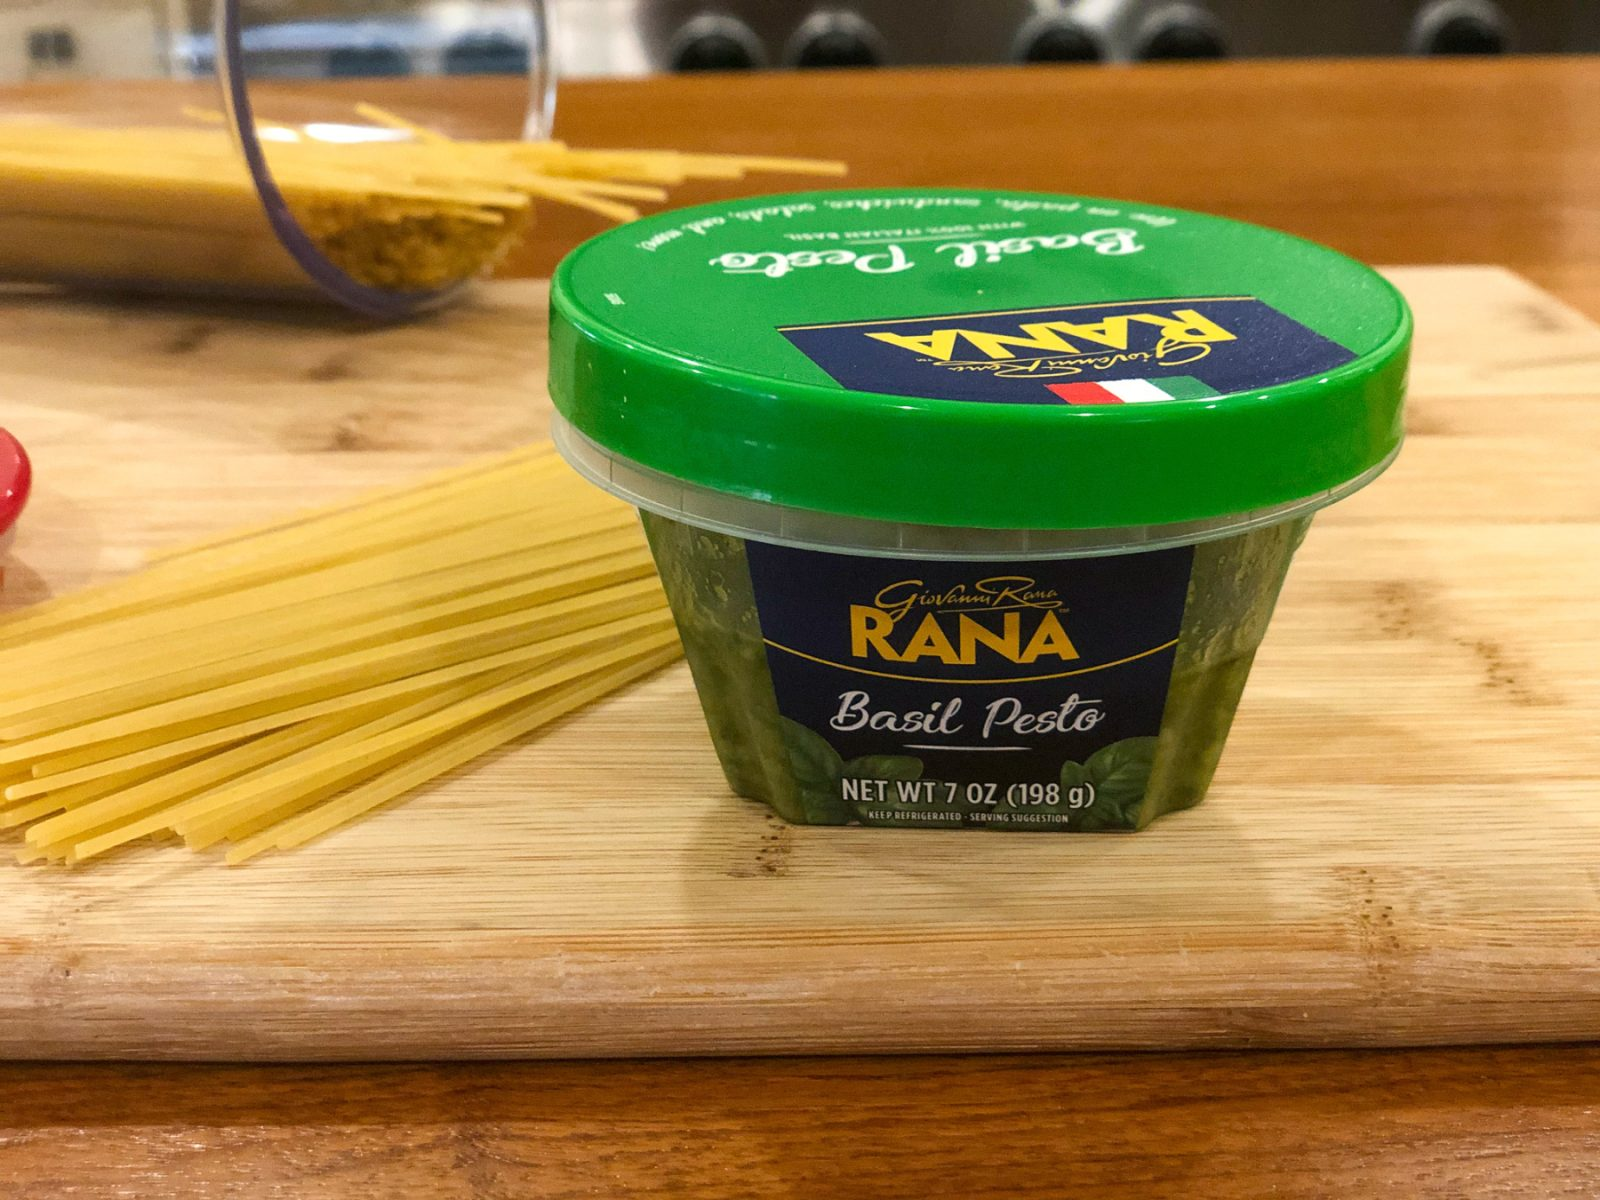 Rana Sauce or Pasta Just $2.50 At Publix on I Heart Publix